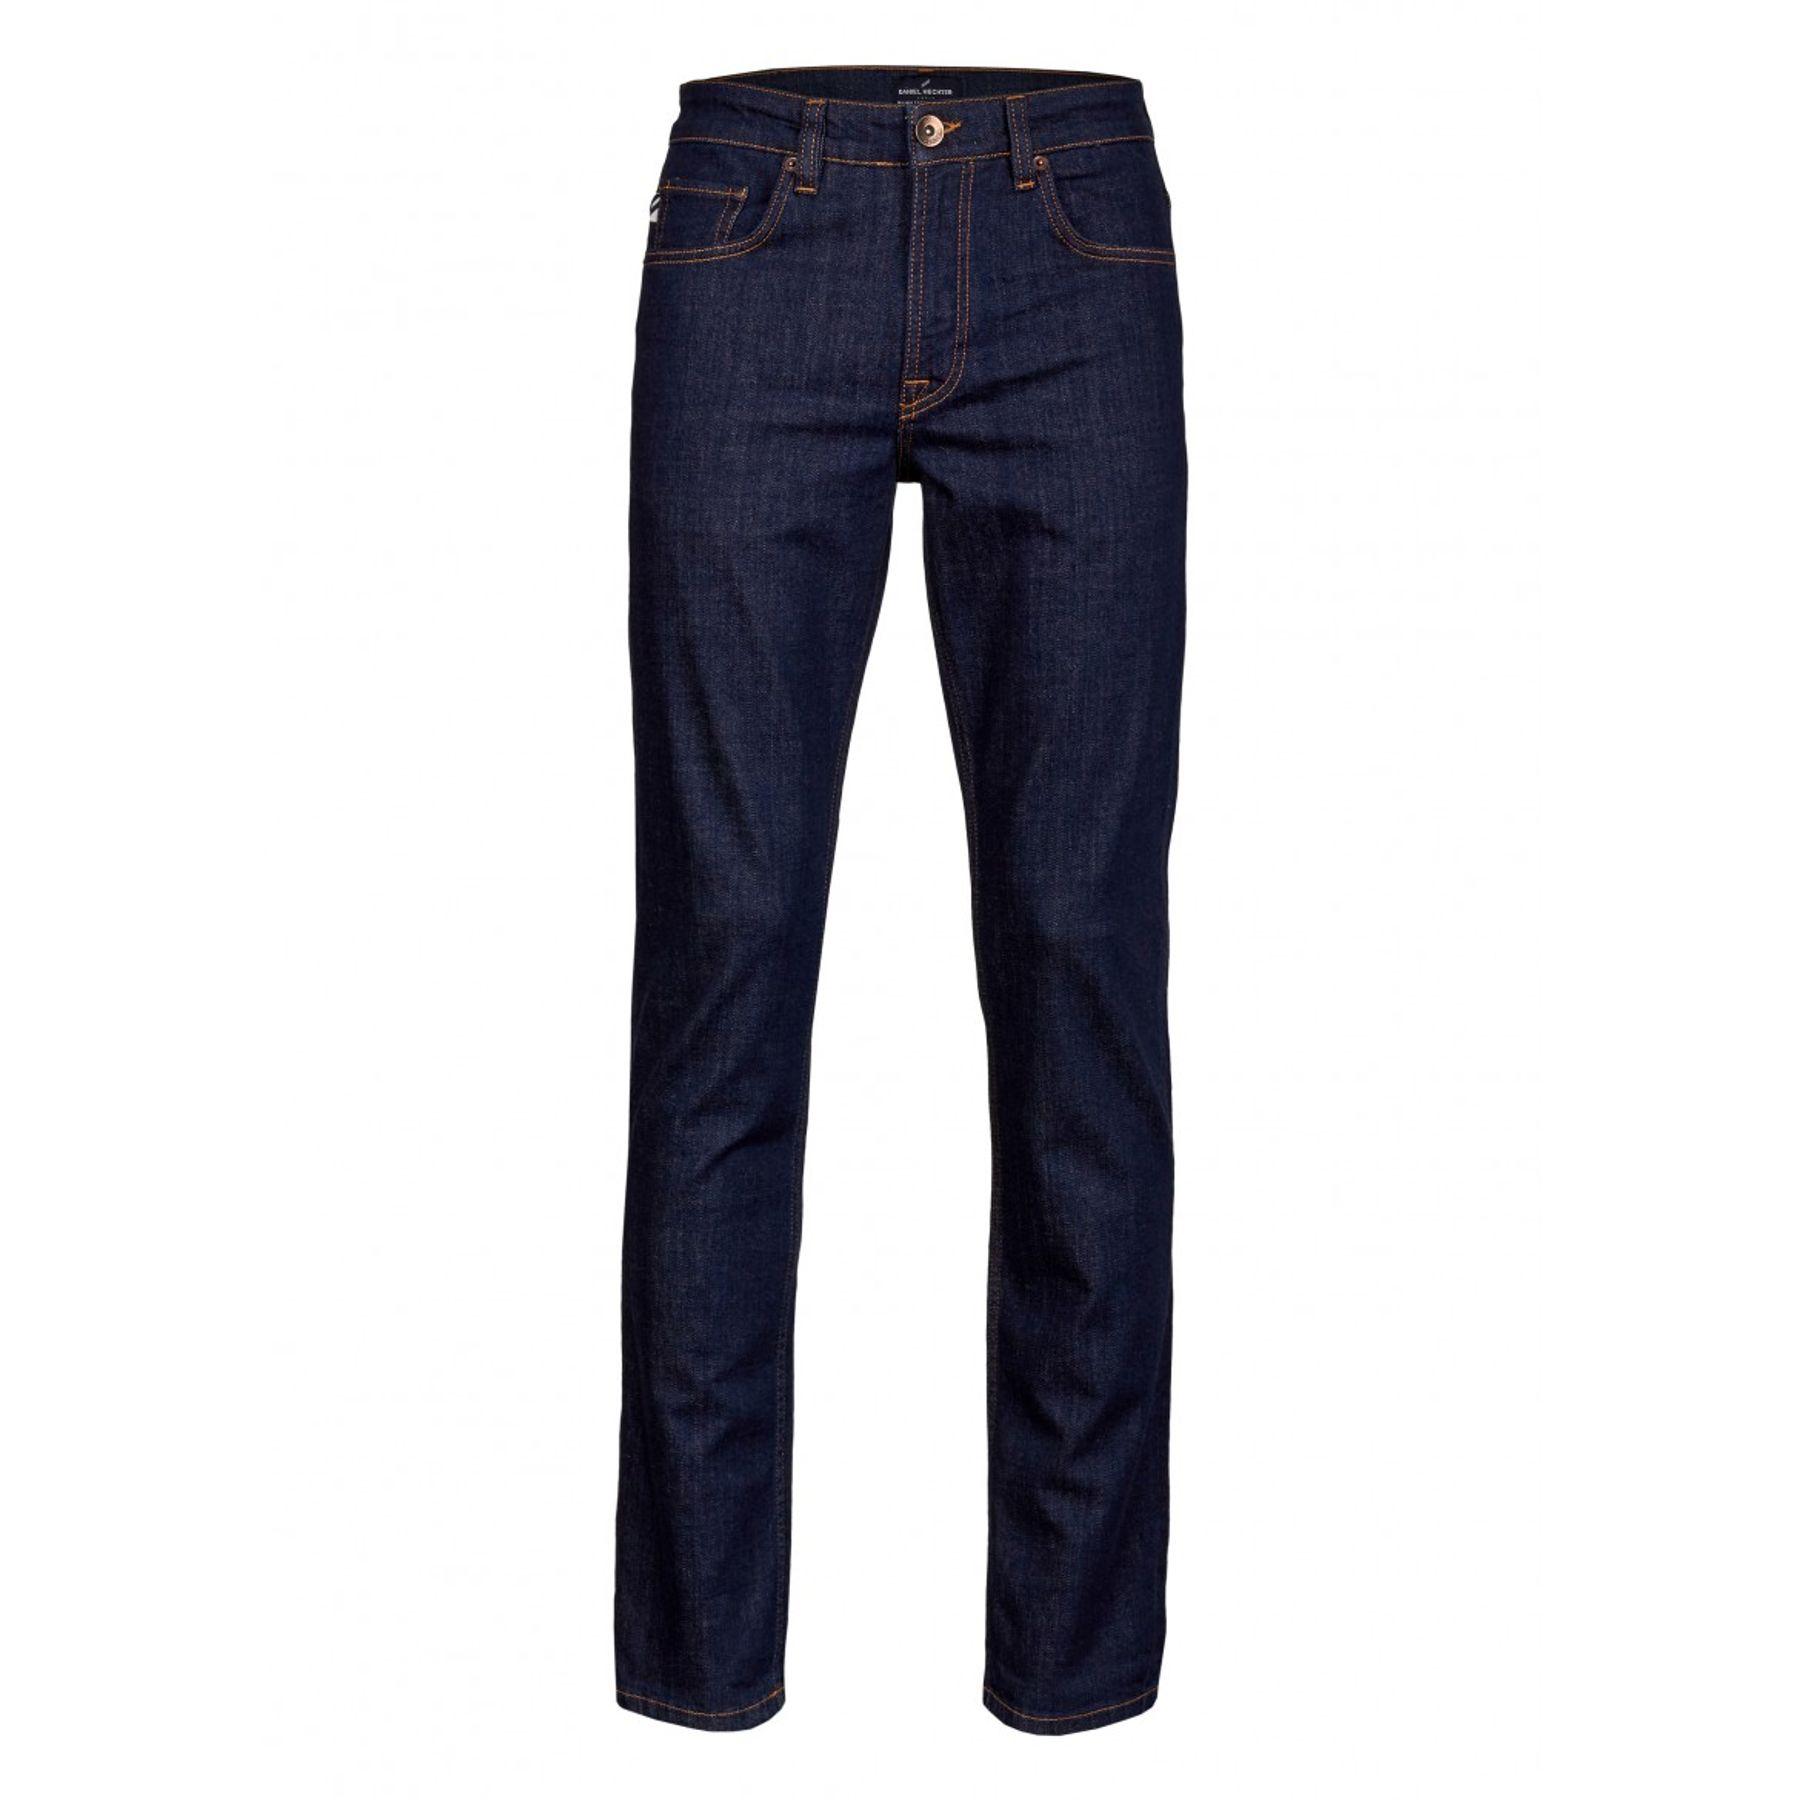 Daniel Hechter - Regular Comfort Fit - Herren 5-Pocket Jeans in Blau oder Dunkelblau (100350) – Bild 1